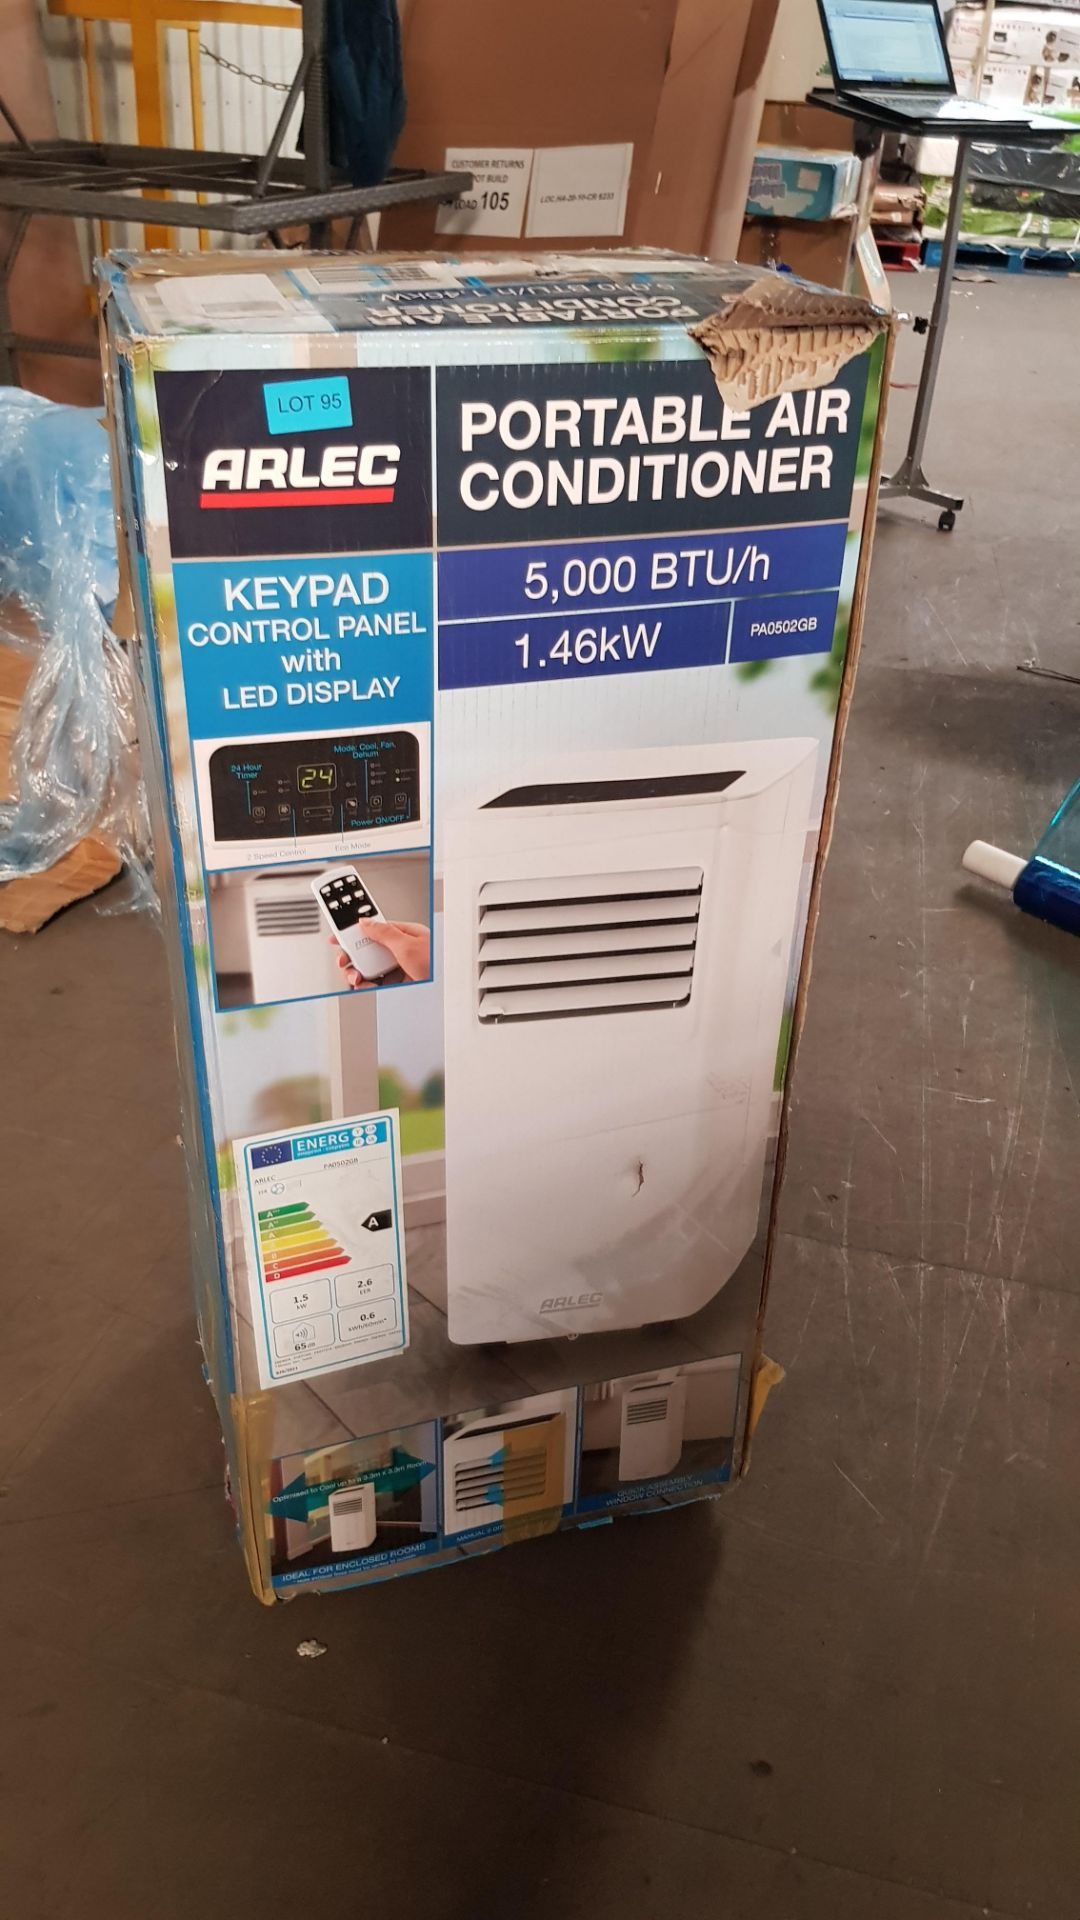 (P2) 1x Arlec Portable Air Conditioner 5000 BTU/h. RRP £300.00. - Image 3 of 3